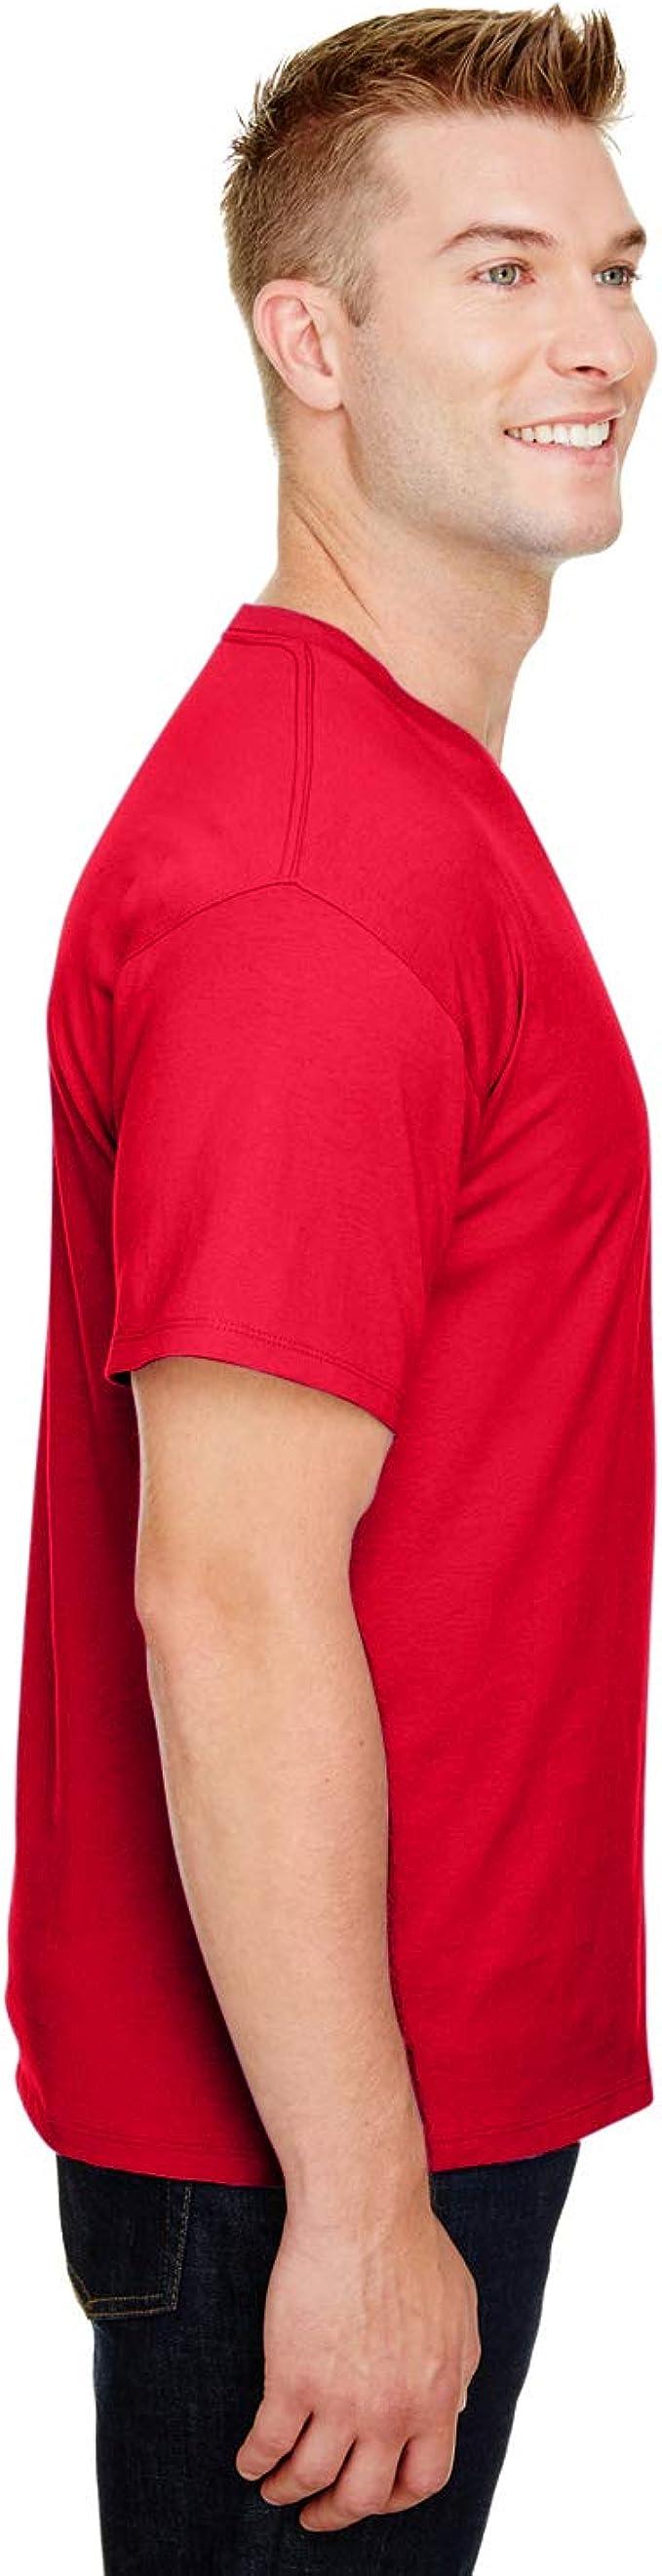 Premium Classics Short Sleeve T-Shirt Champion CP10